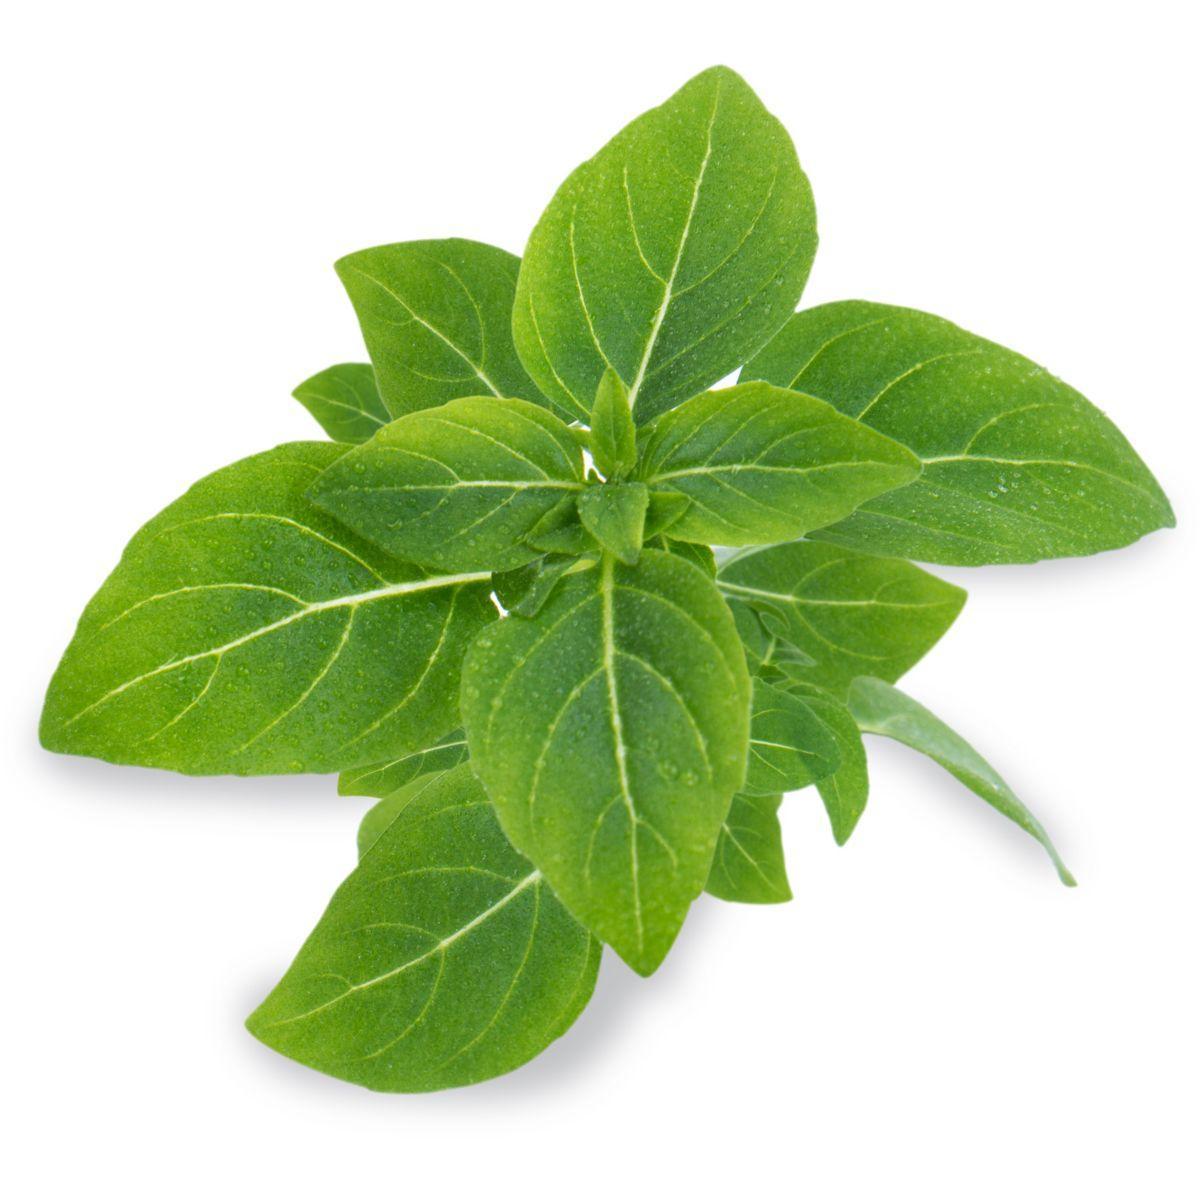 Recharge veritable basilic fin vert nain bio - 5% de remise imm�diate avec le code : priv5 (photo)